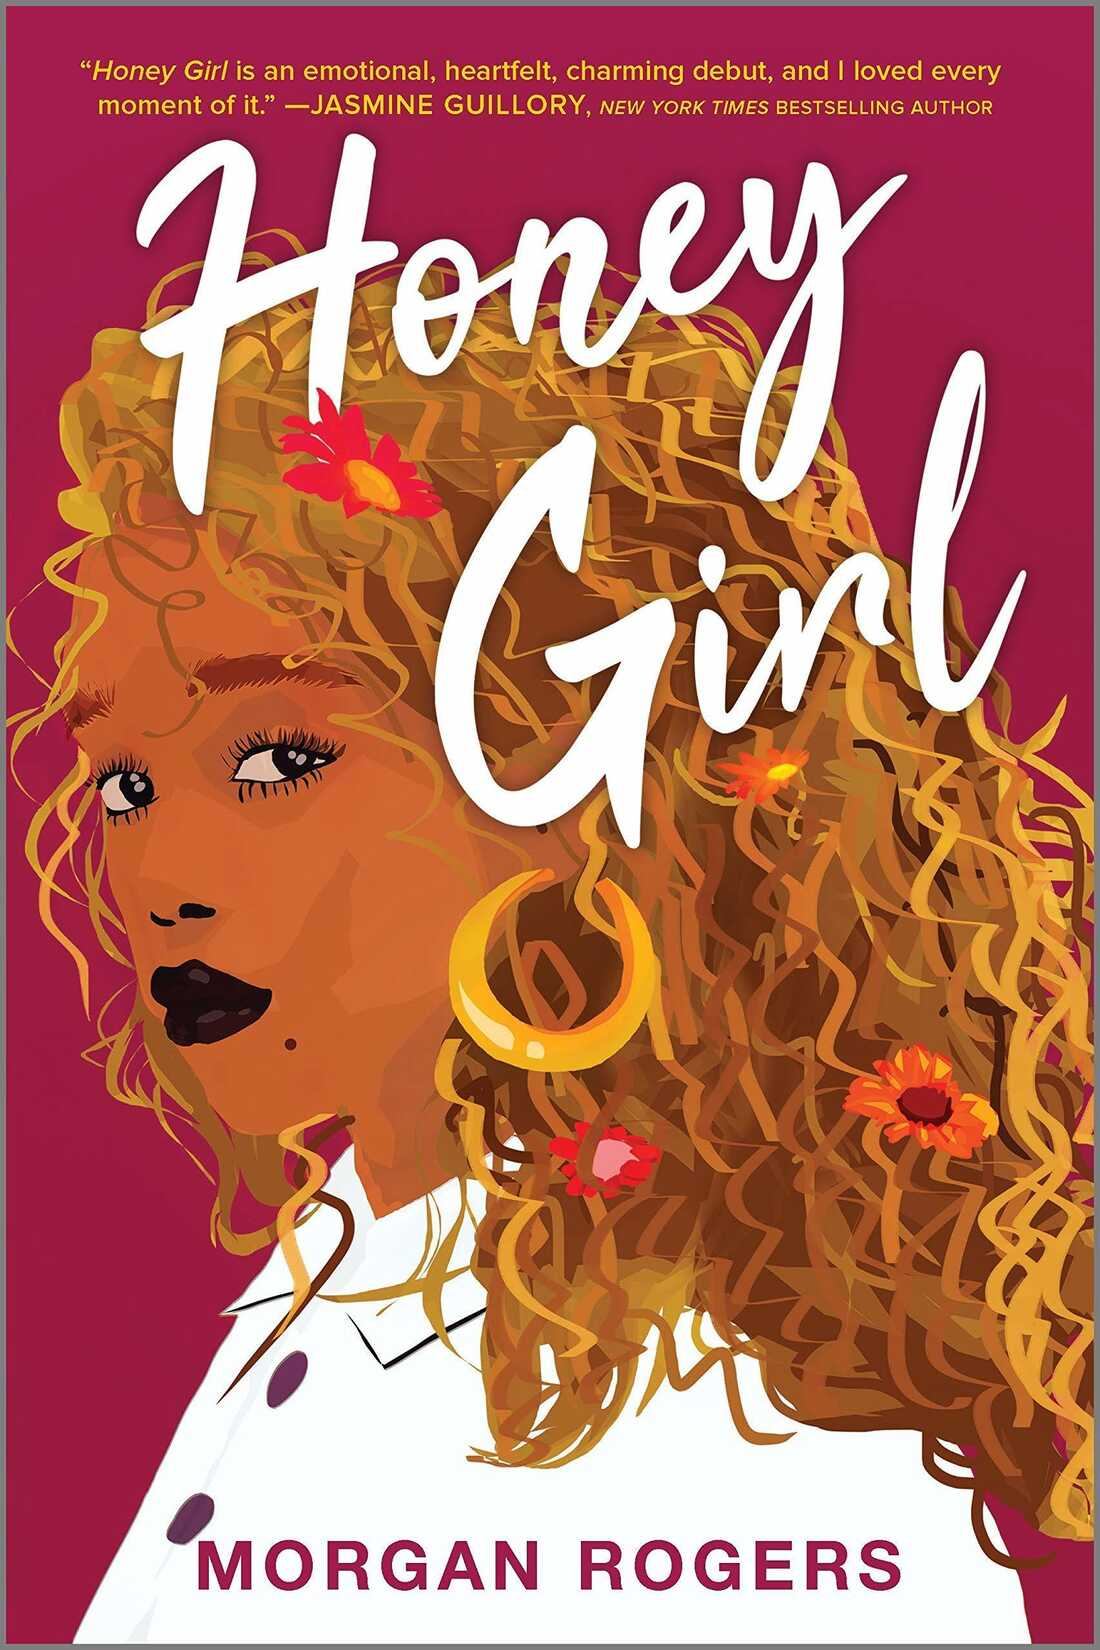 Honey Girl, by Morgan Rogers